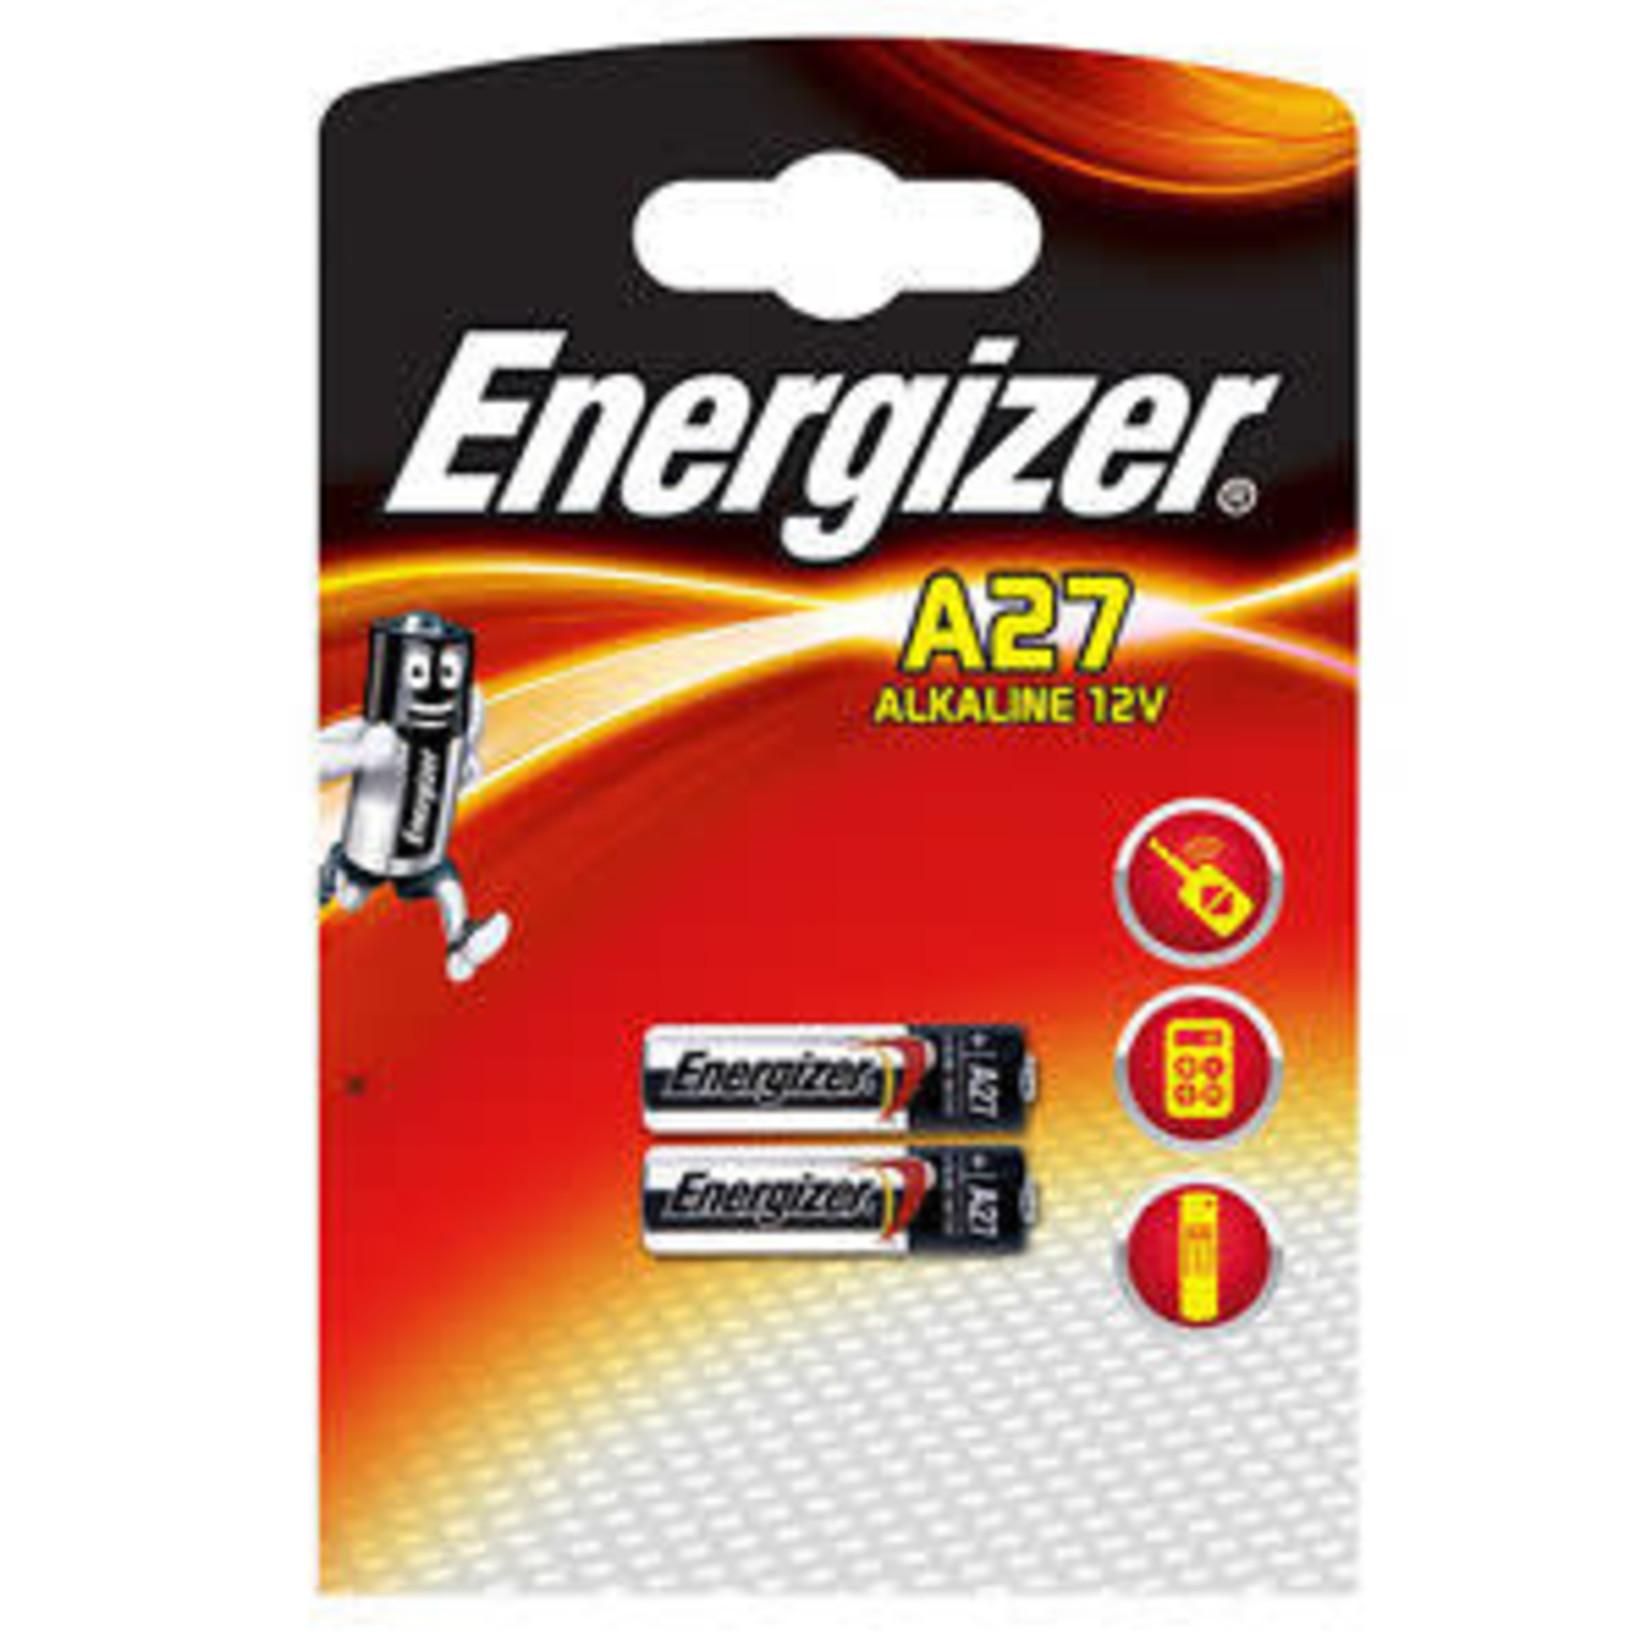 A27 12 VOLT ENERGIZER BATTERY 2 PACK